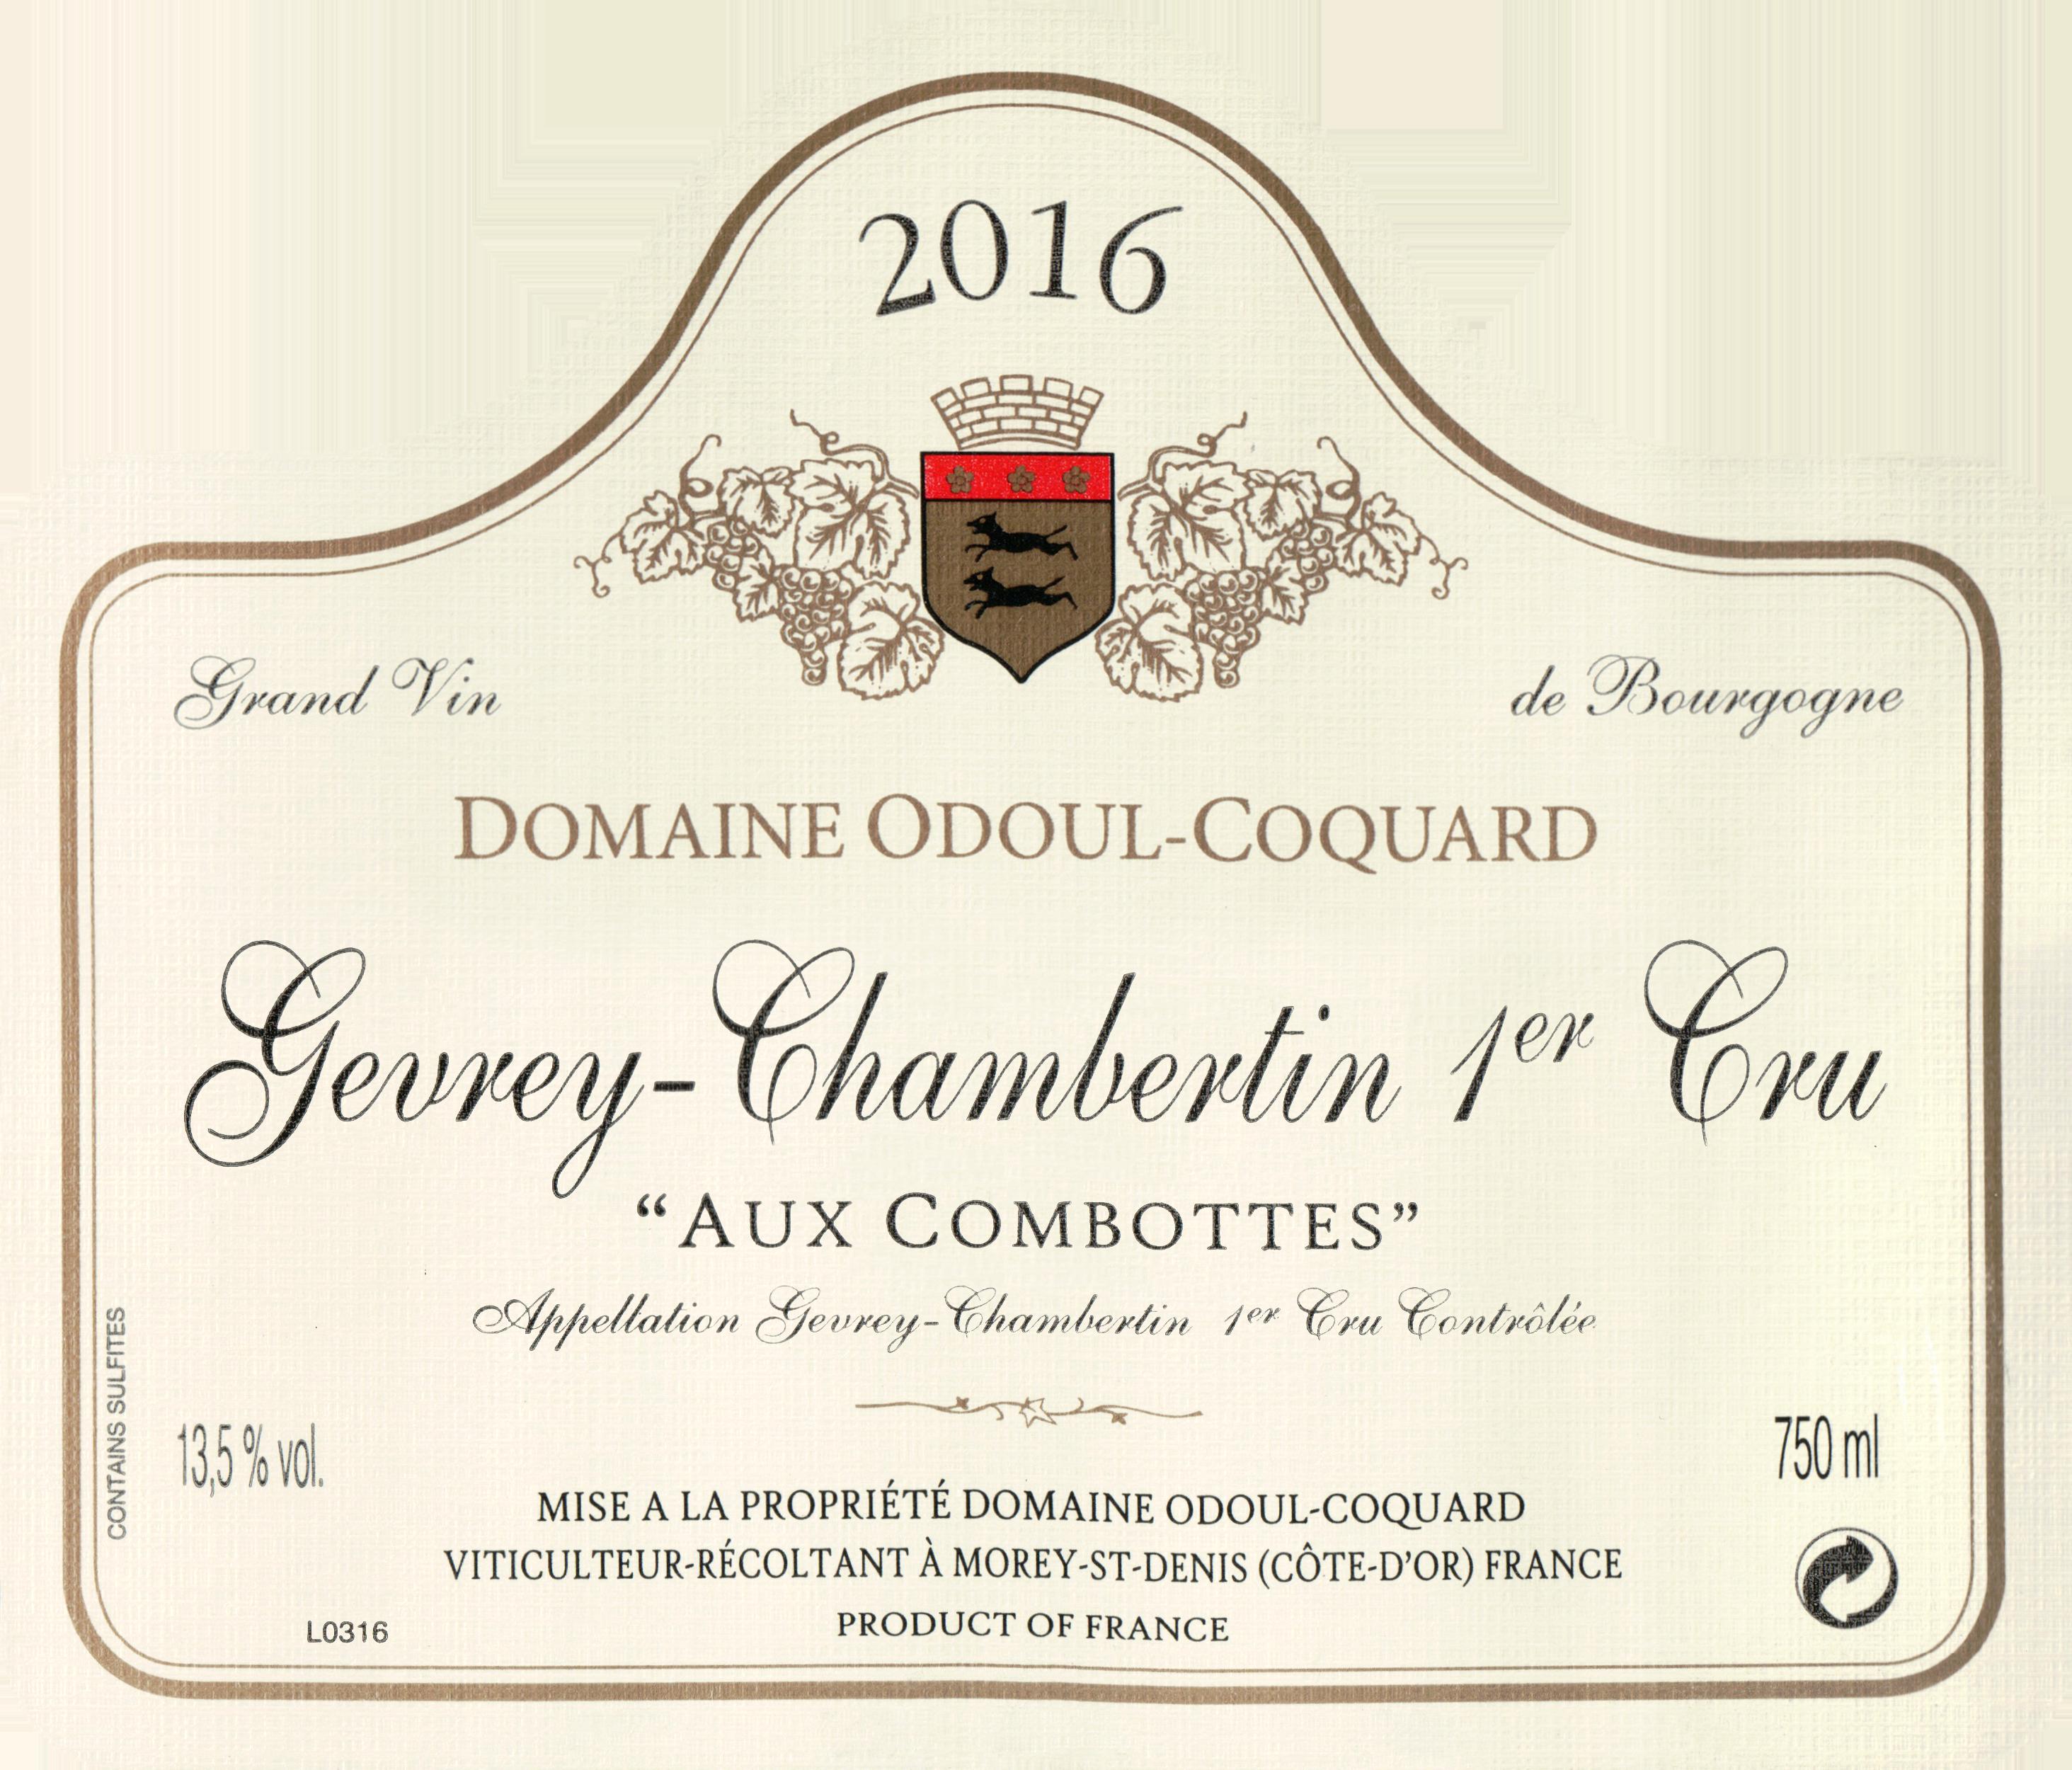 Domaine Odoul Coquard Gevrey Chambertin Aux Combottes 1er Cru 2016